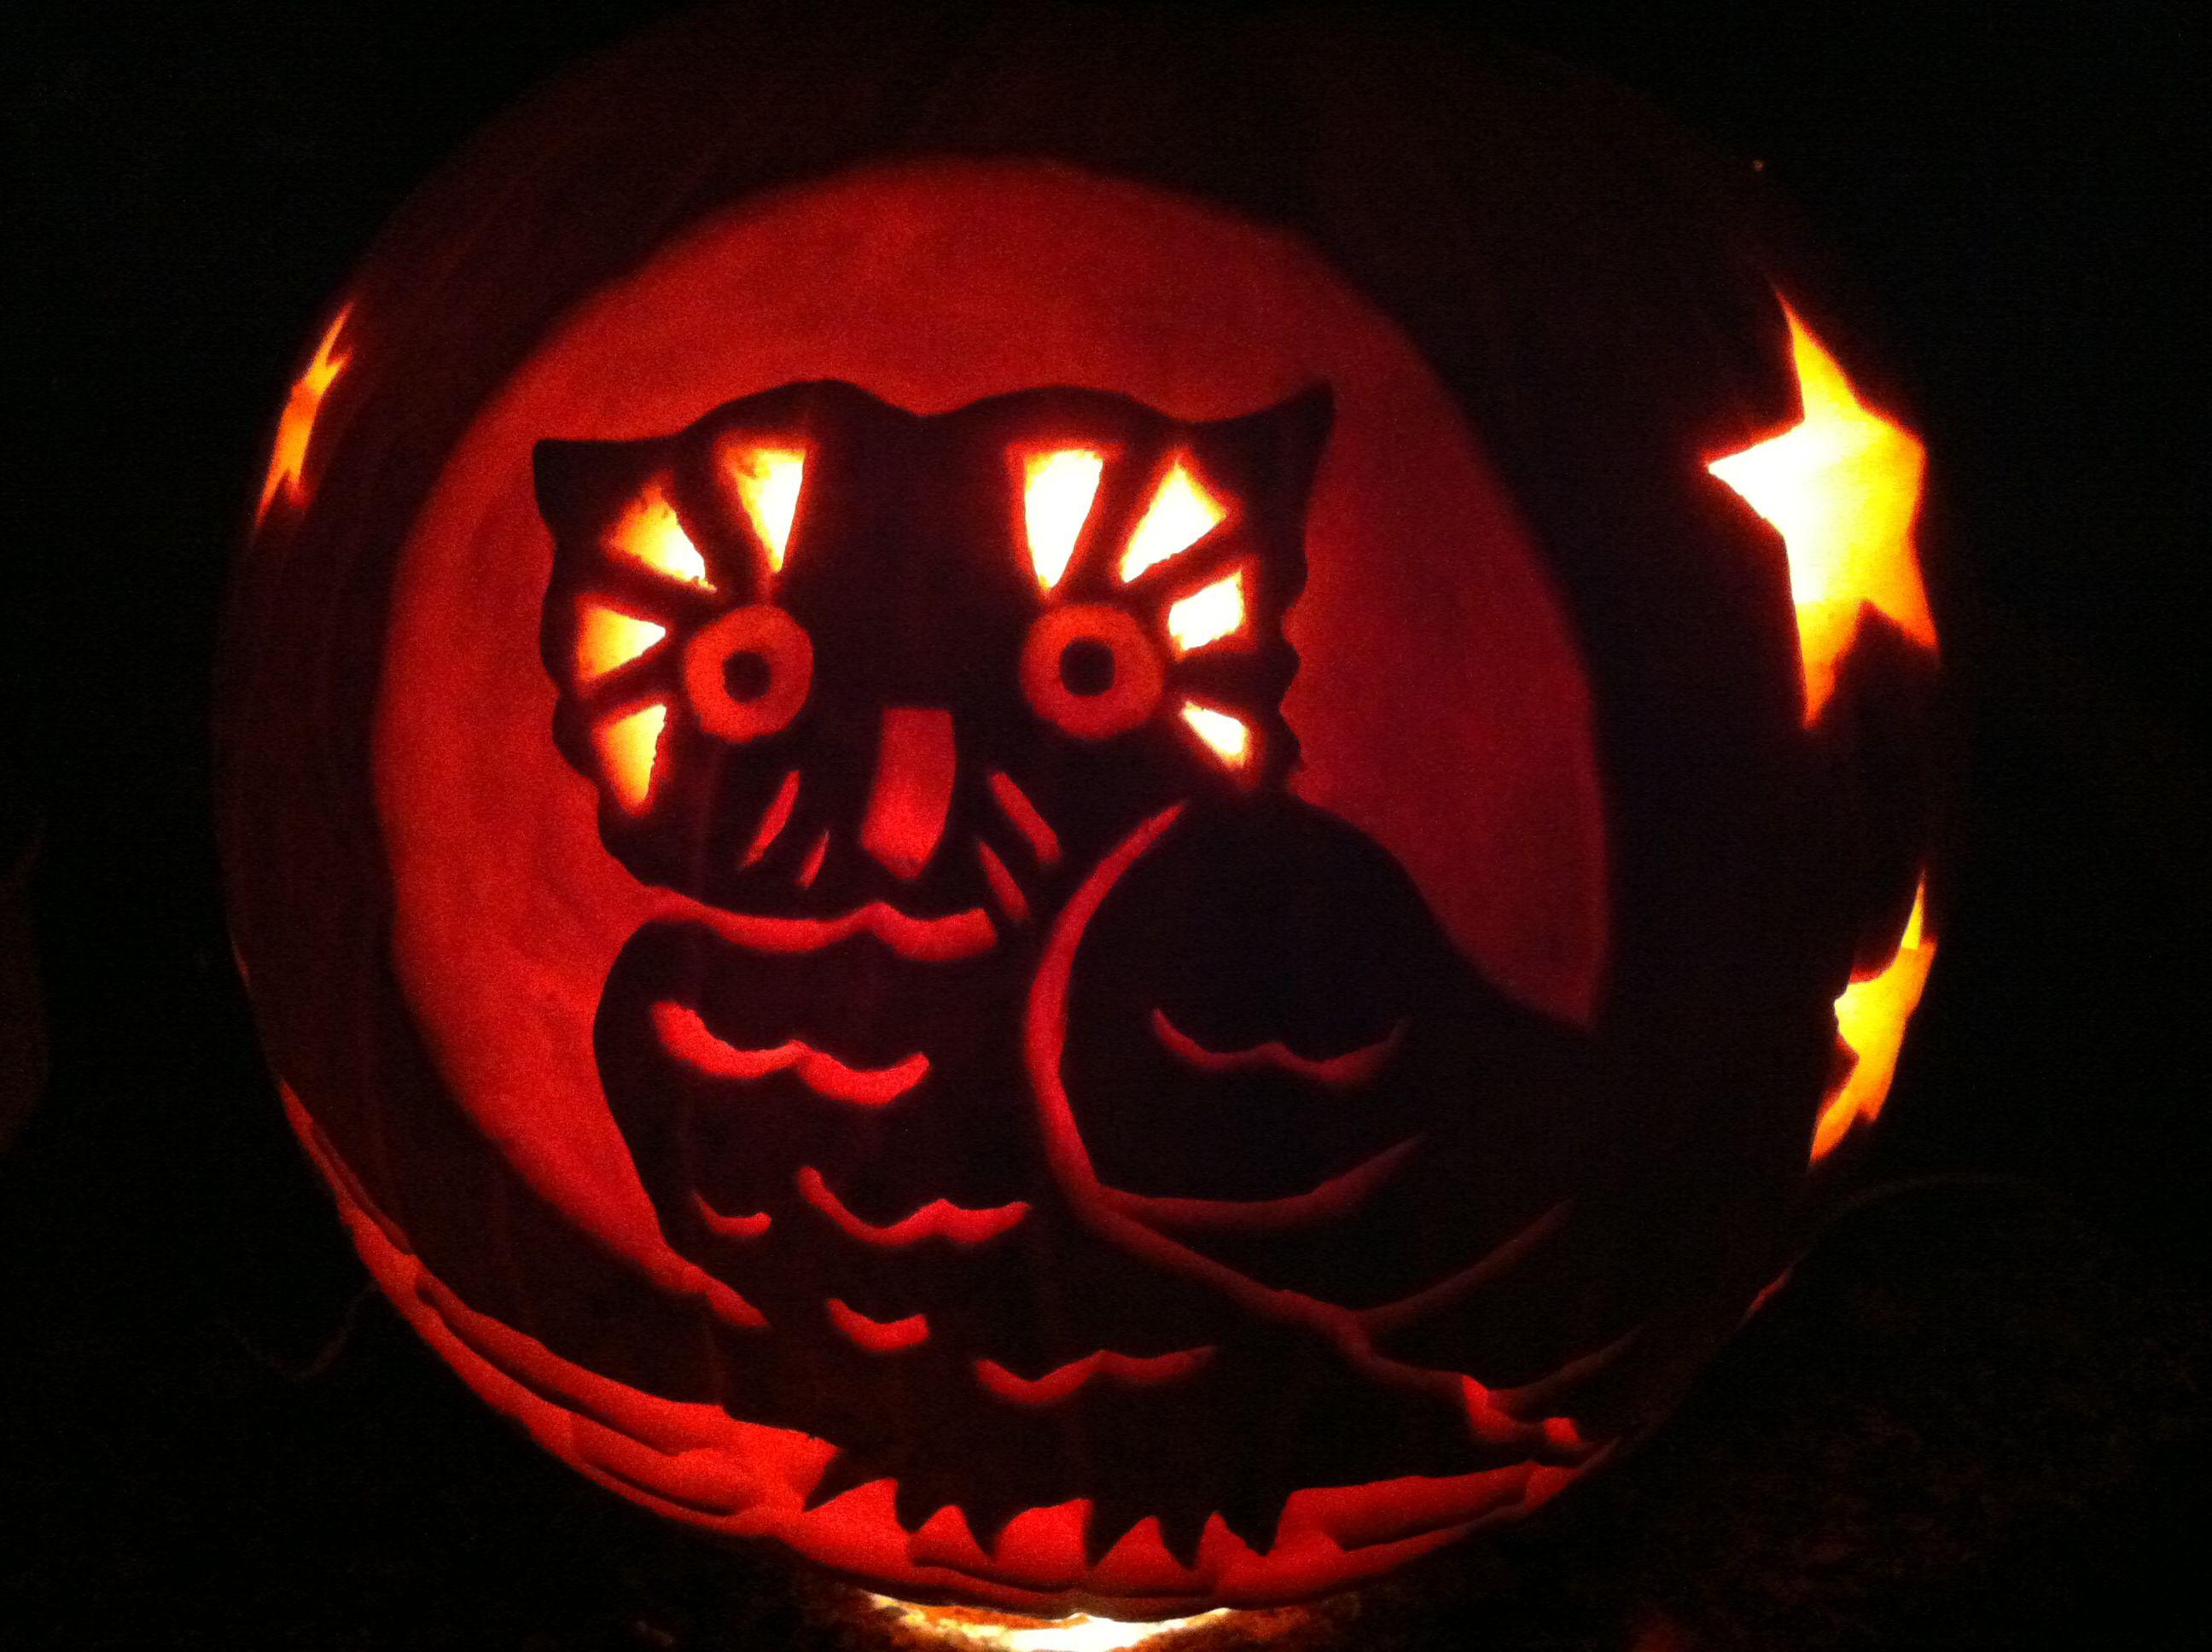 Night Owl Carved Pumpkin Crafts Pinterest